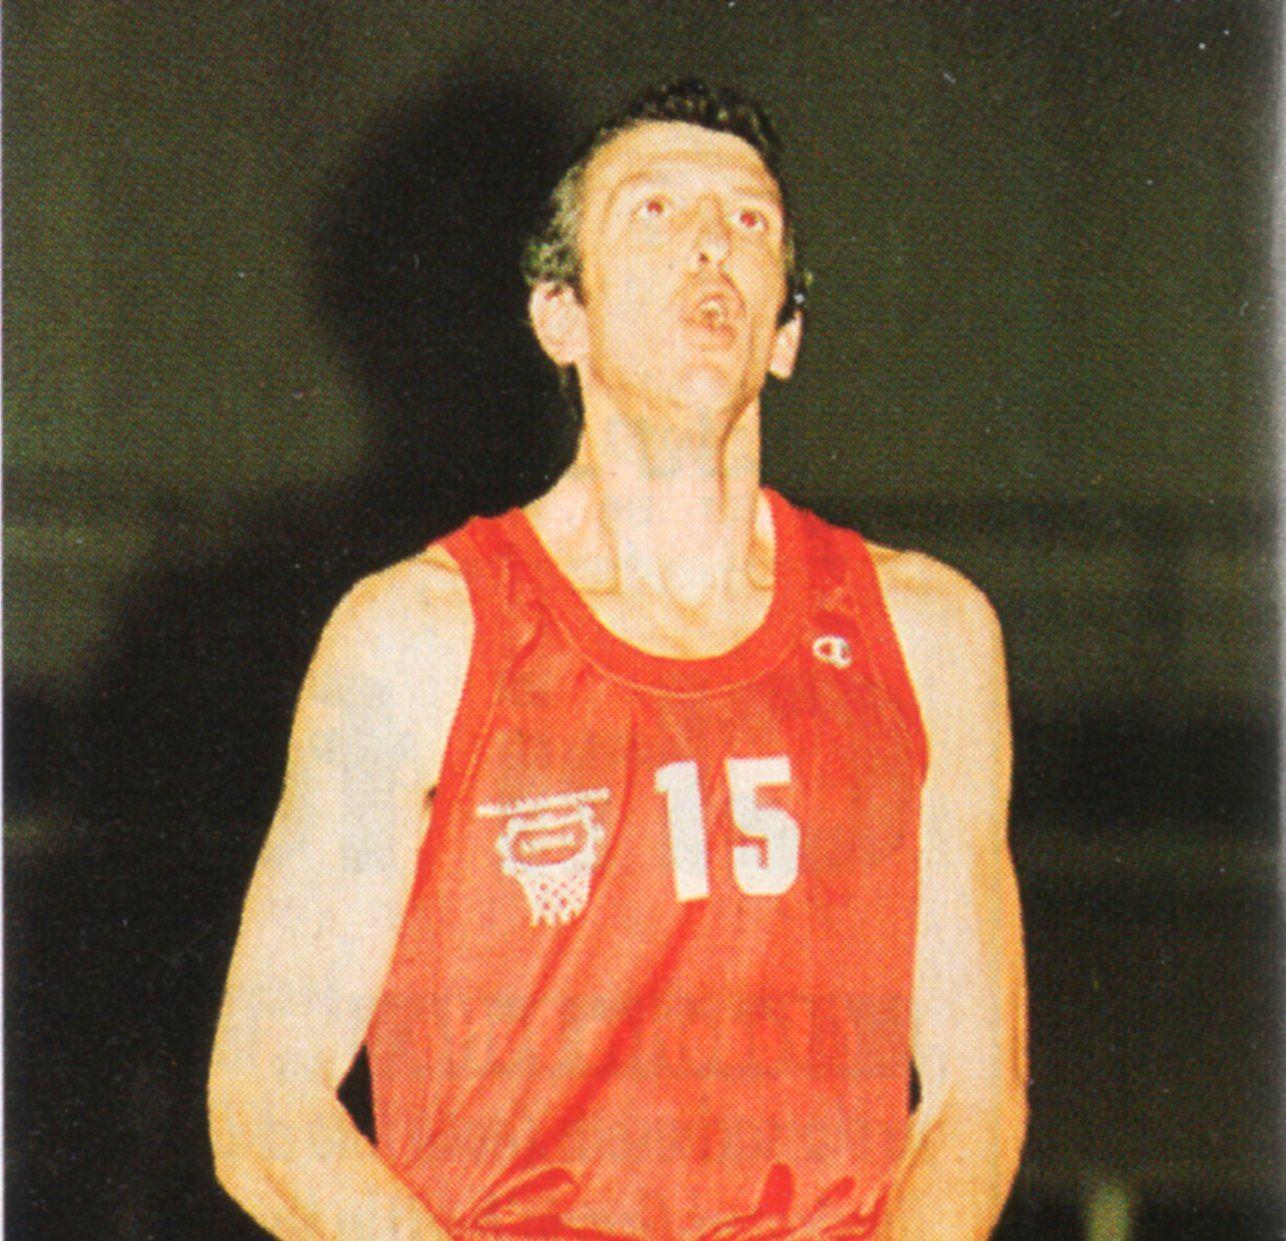 Ivan Drigo